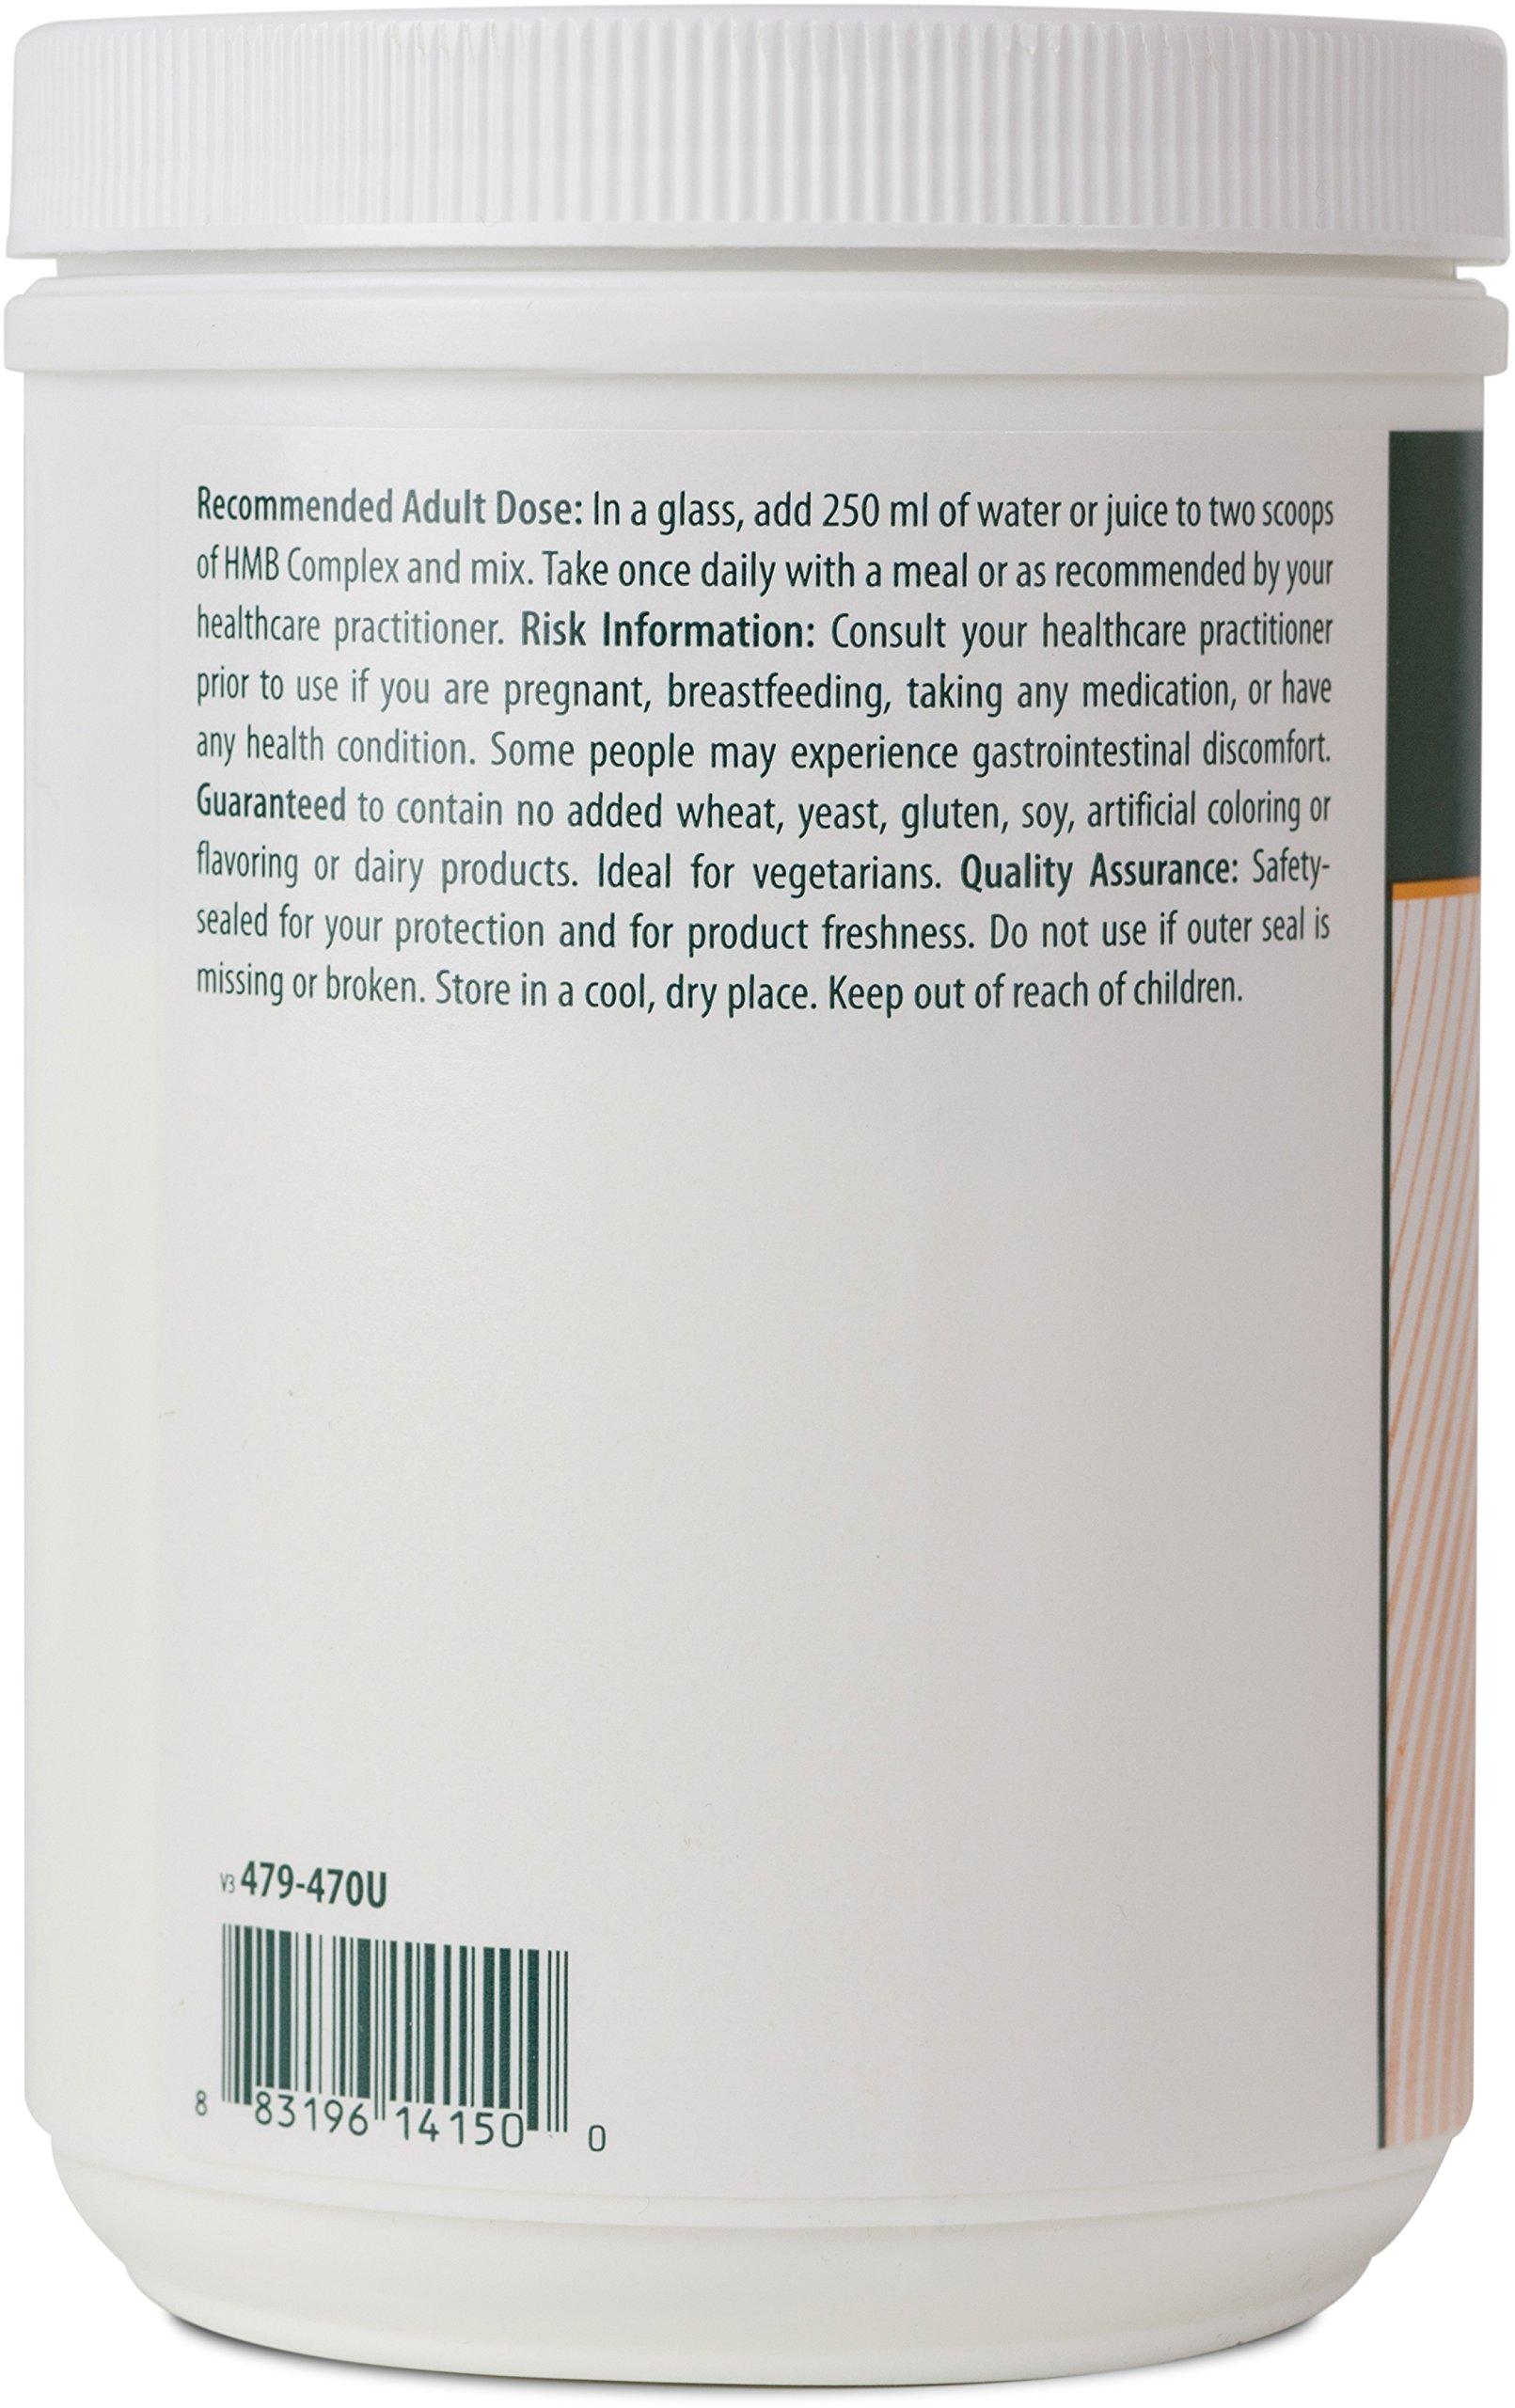 Genestra Brands - HMB Complex - Vegetarian Amino Acid Powder Supplement - Natural Orange Flavor - 16.6 oz (470 g) by Genestra Brands (Image #3)